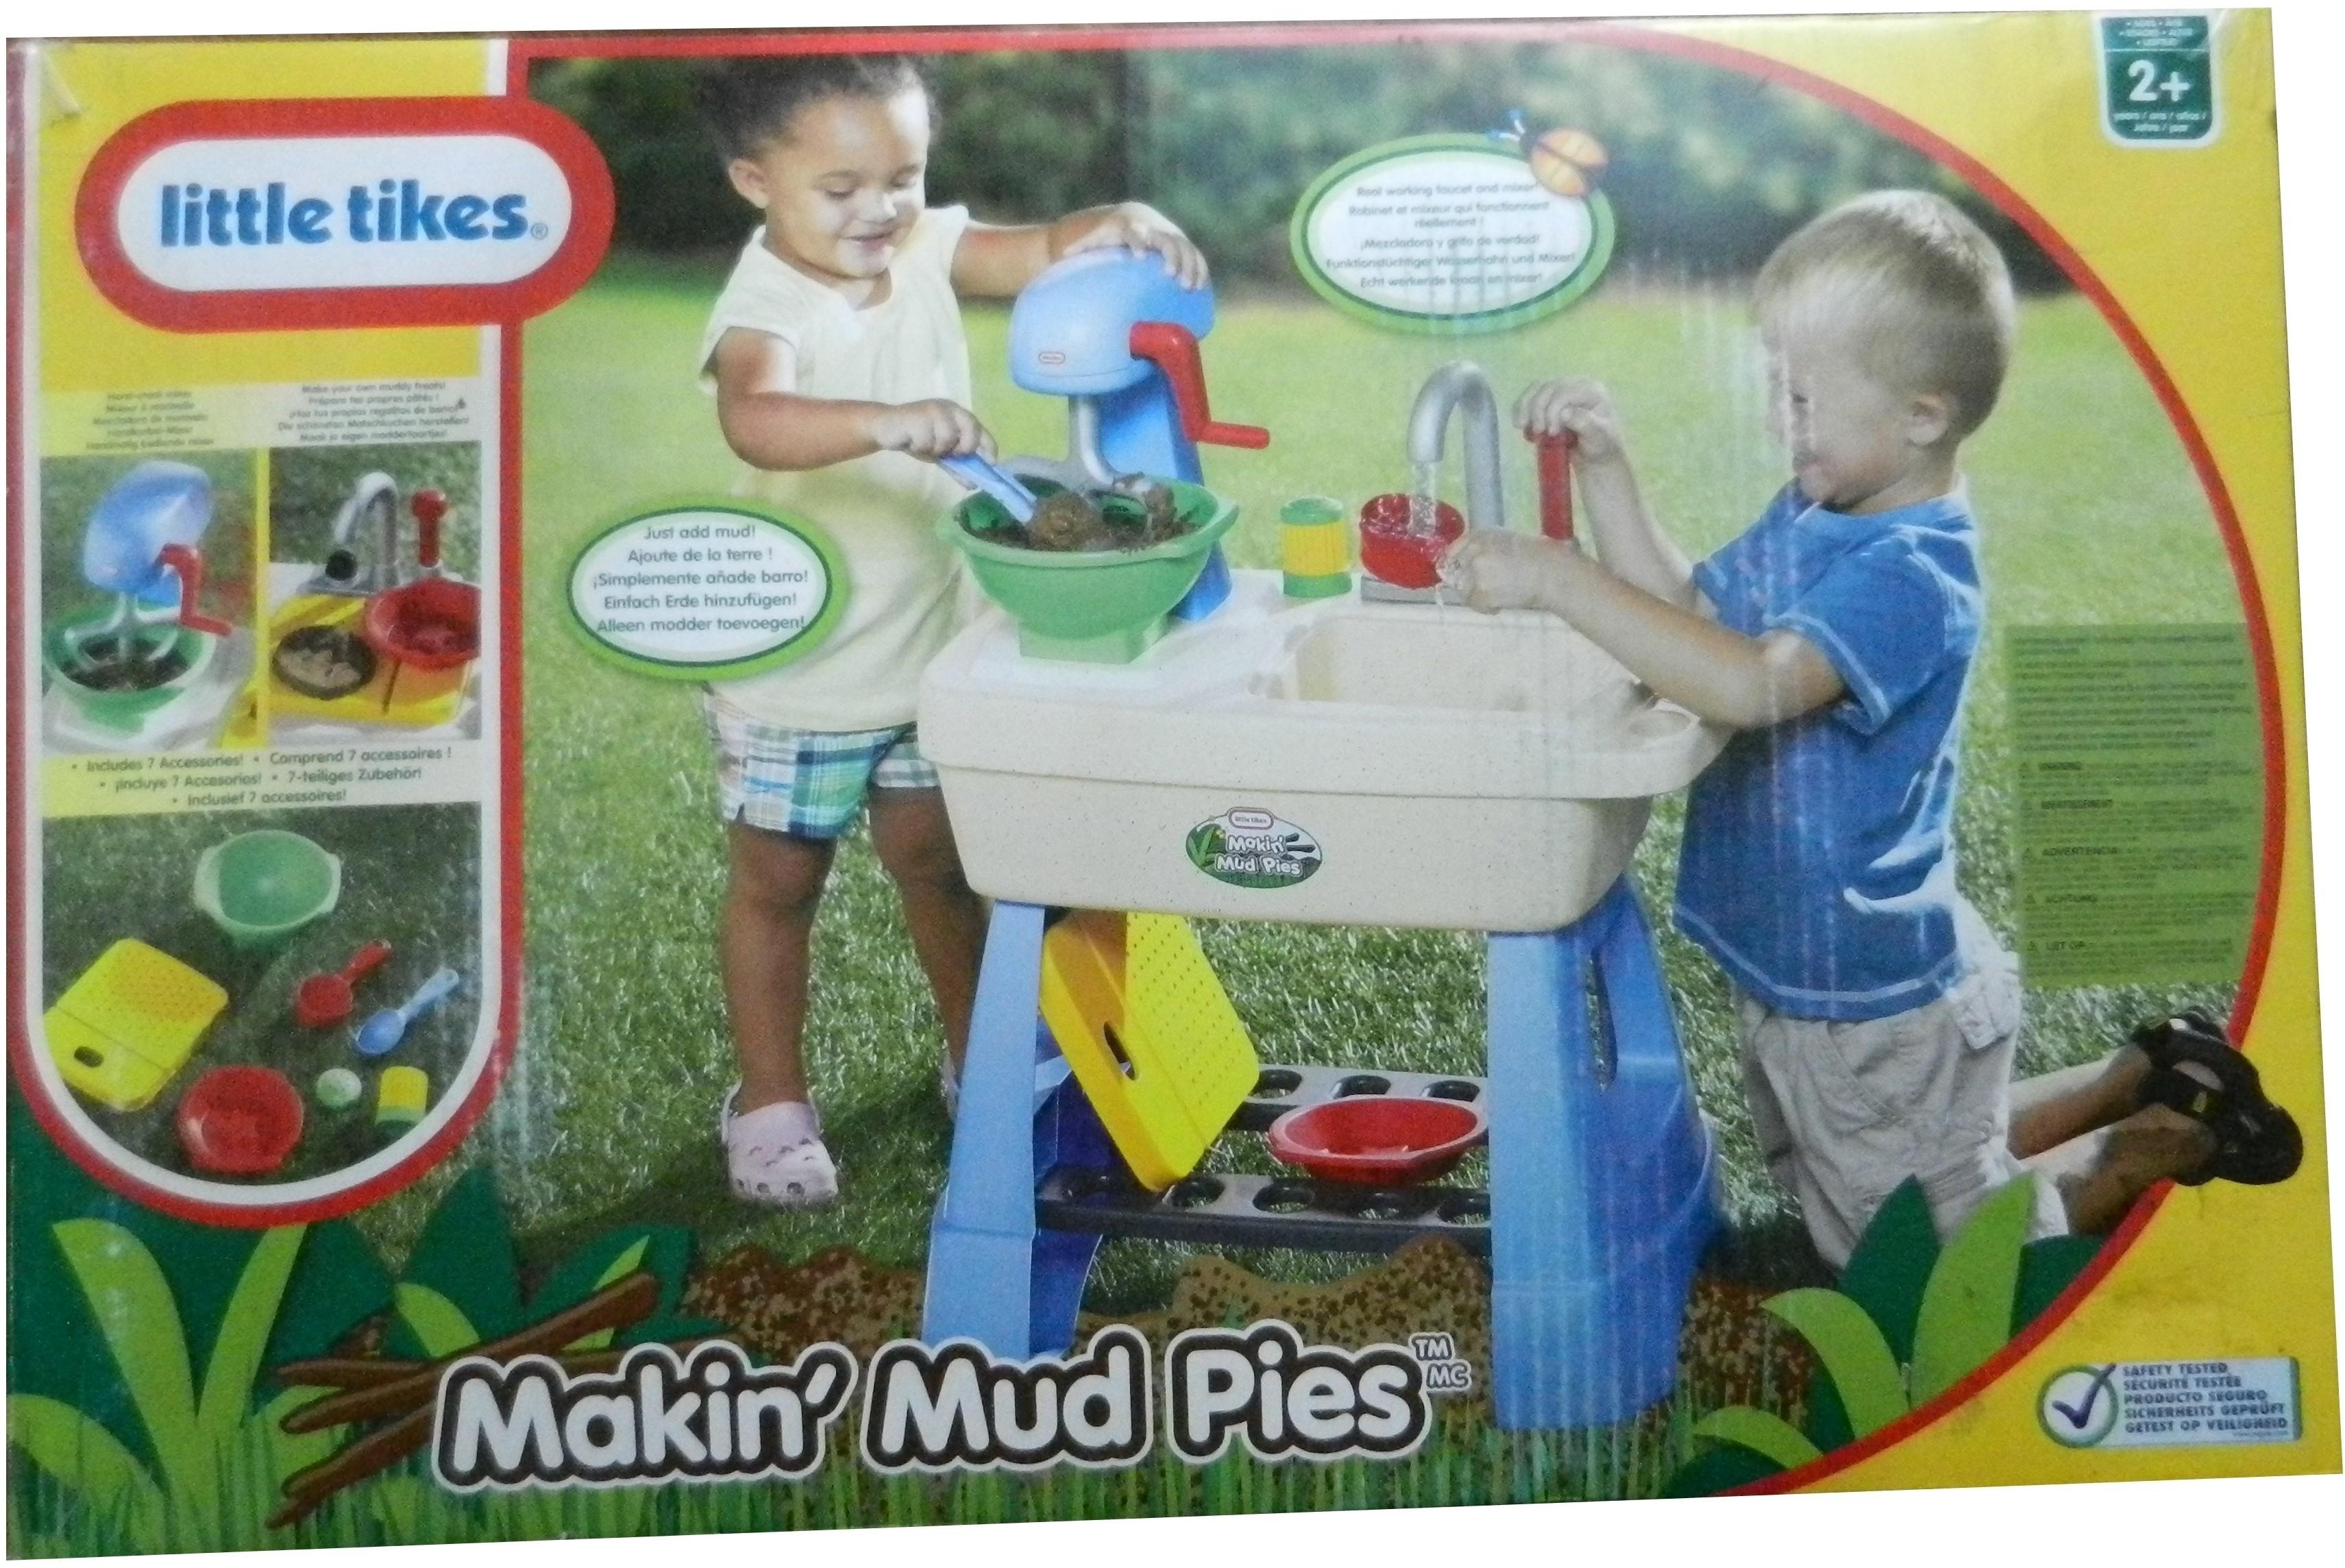 little tikes makin mud pies kitchen.little tikes makin' mud pies